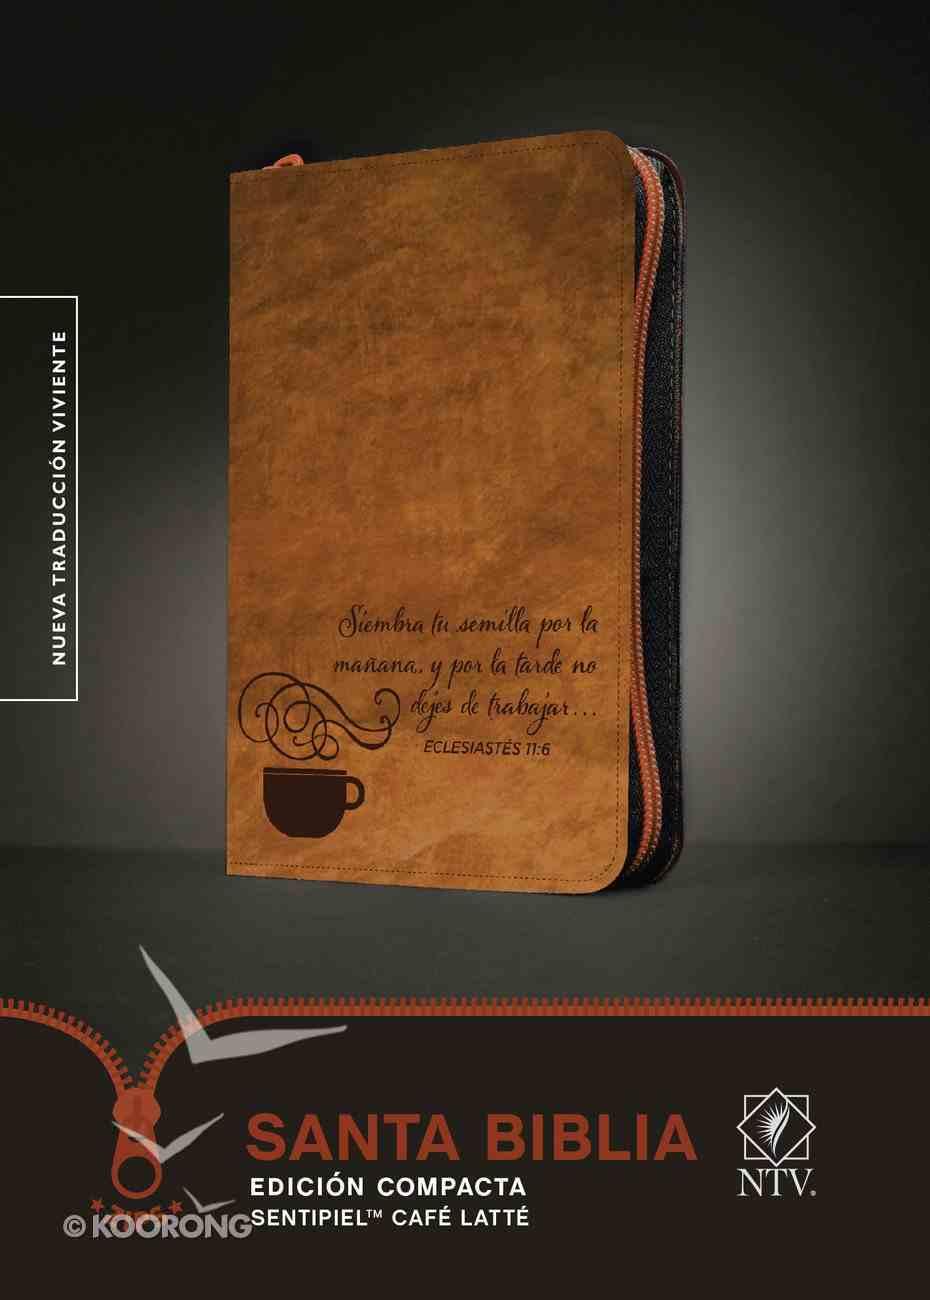 Ntv Santa Biblia Edicion Compacta Coffee Latte With Zipper (Black Letter Edition) Imitation Leather